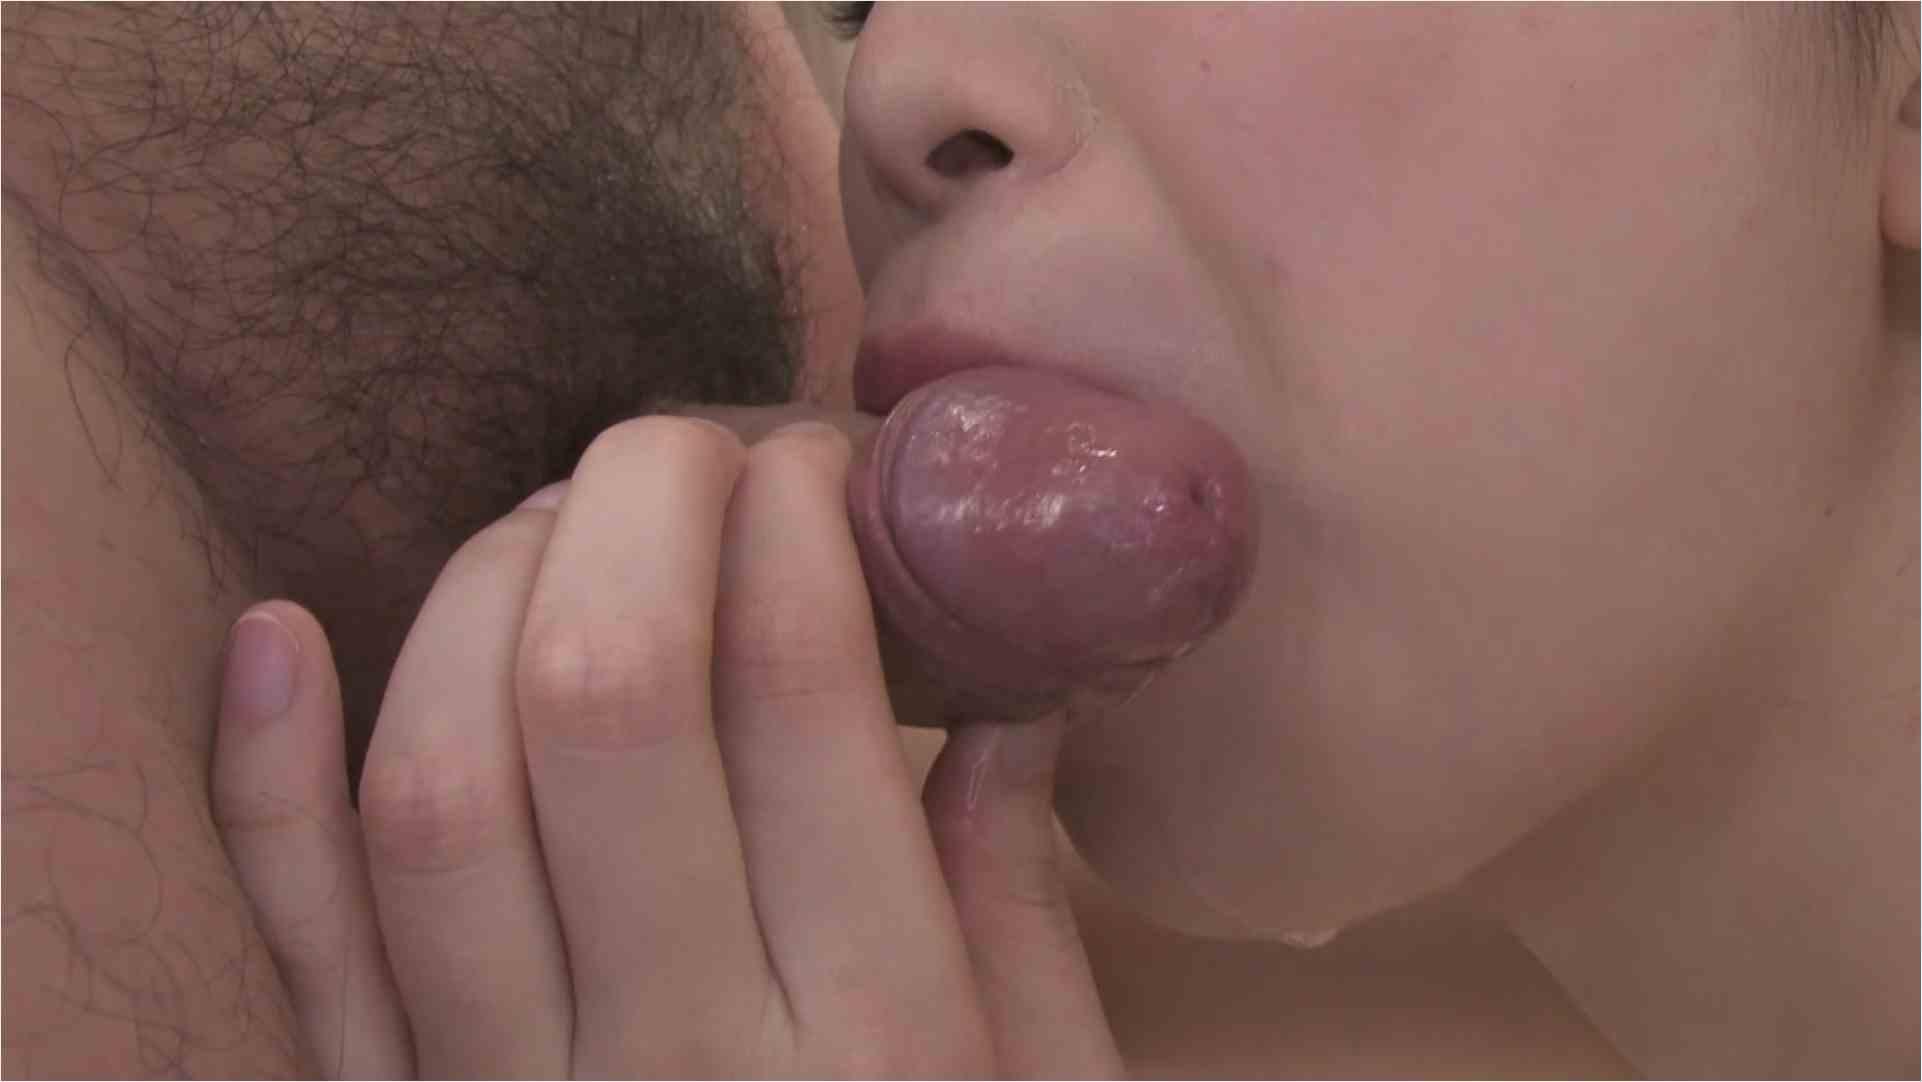 Heyzo-1950-ボクの乳首を執拗に責めてくる痴女姉さん Vol.2